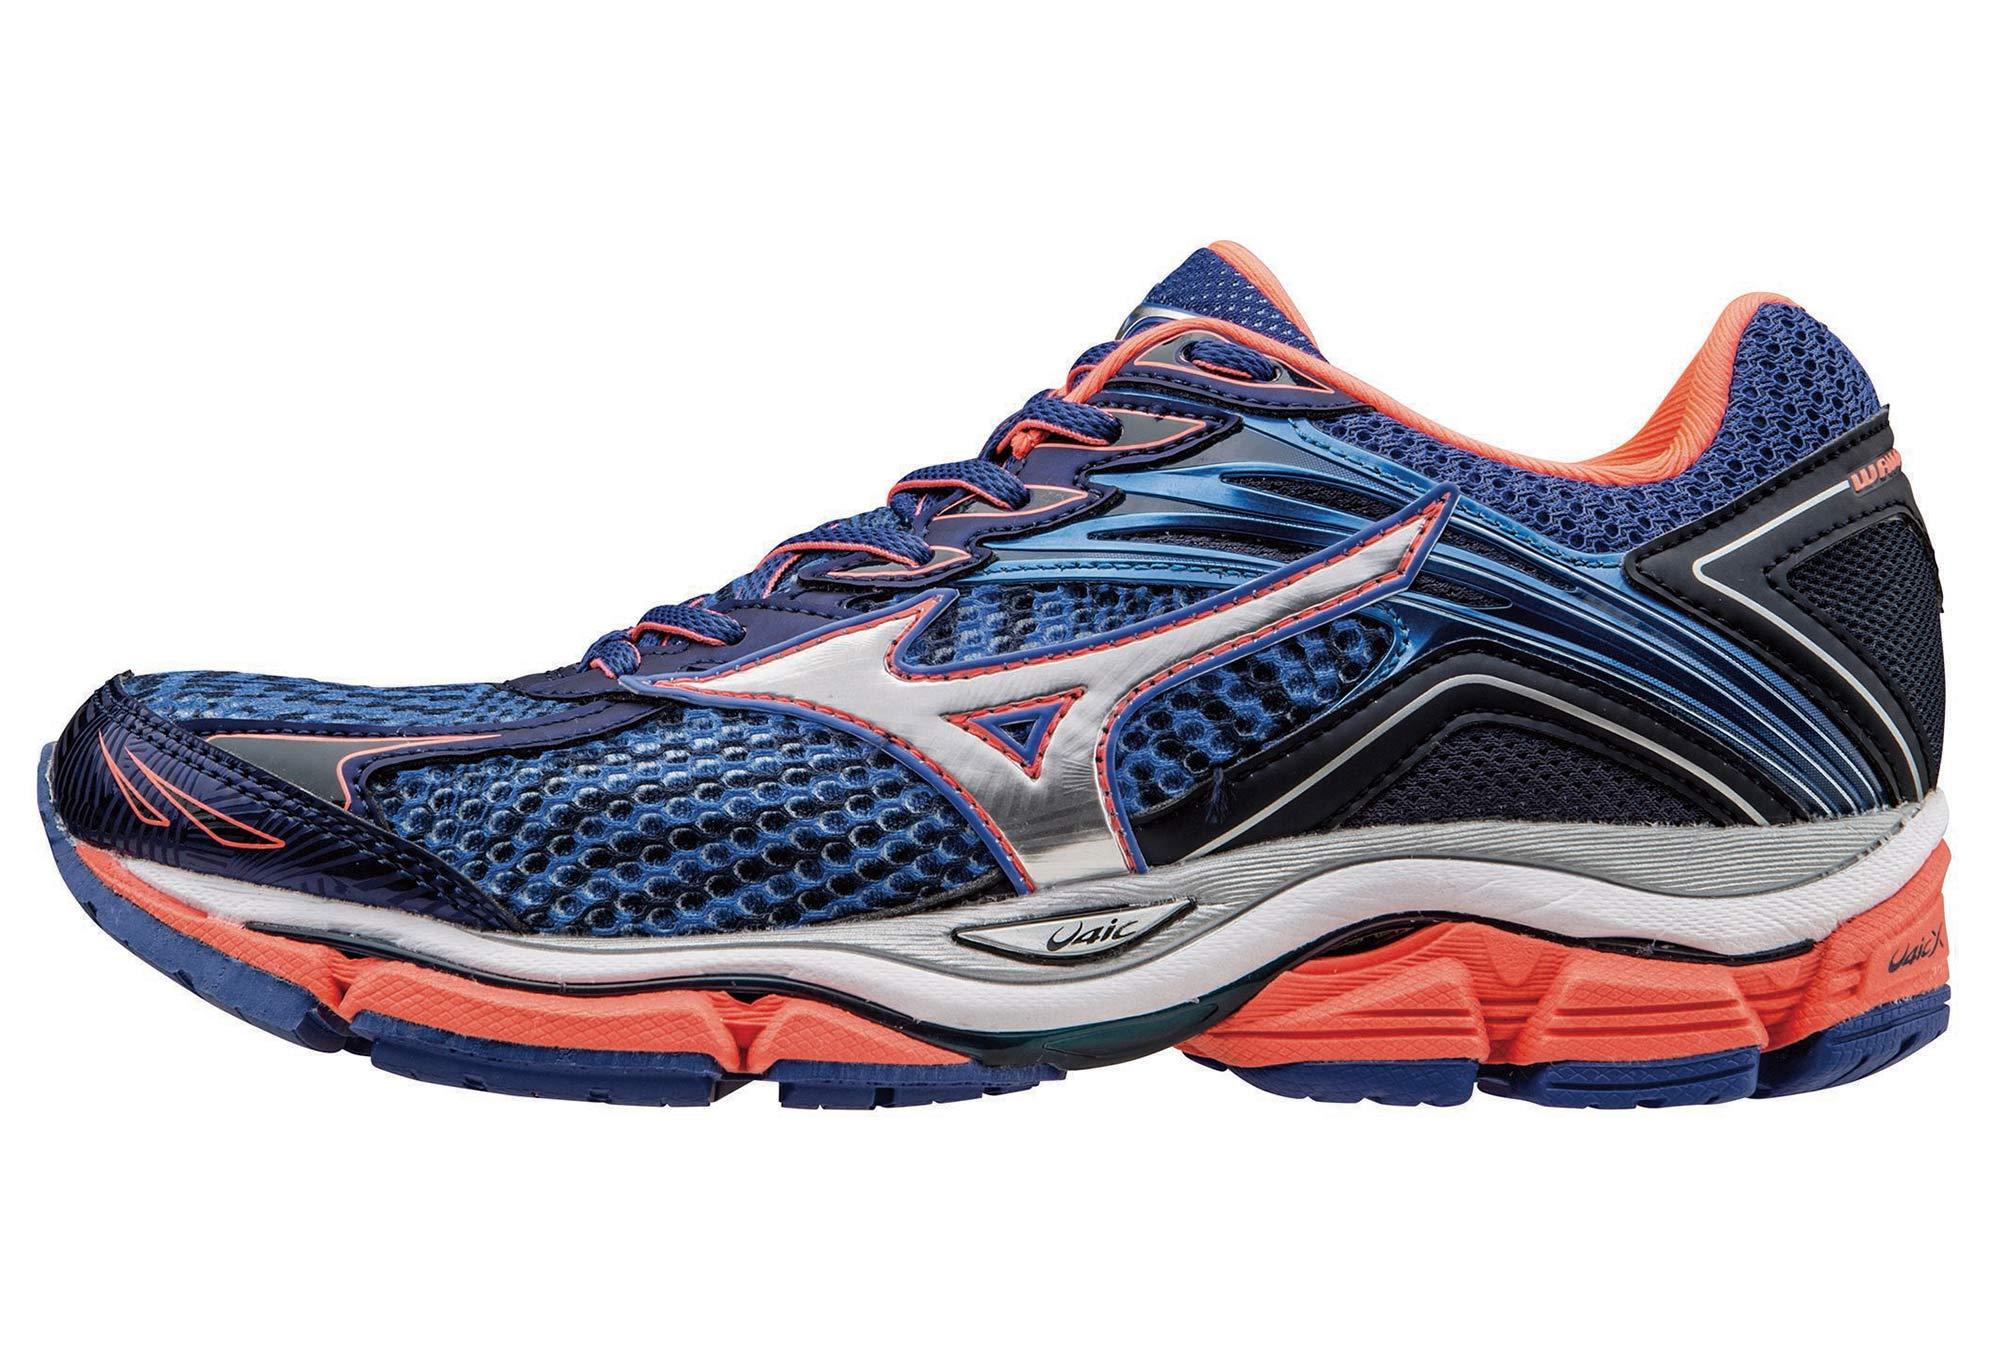 3499f6982ad Chaussures de Running Femme Mizuno WAVE ENIGMA 6 Bleu   Orange ...